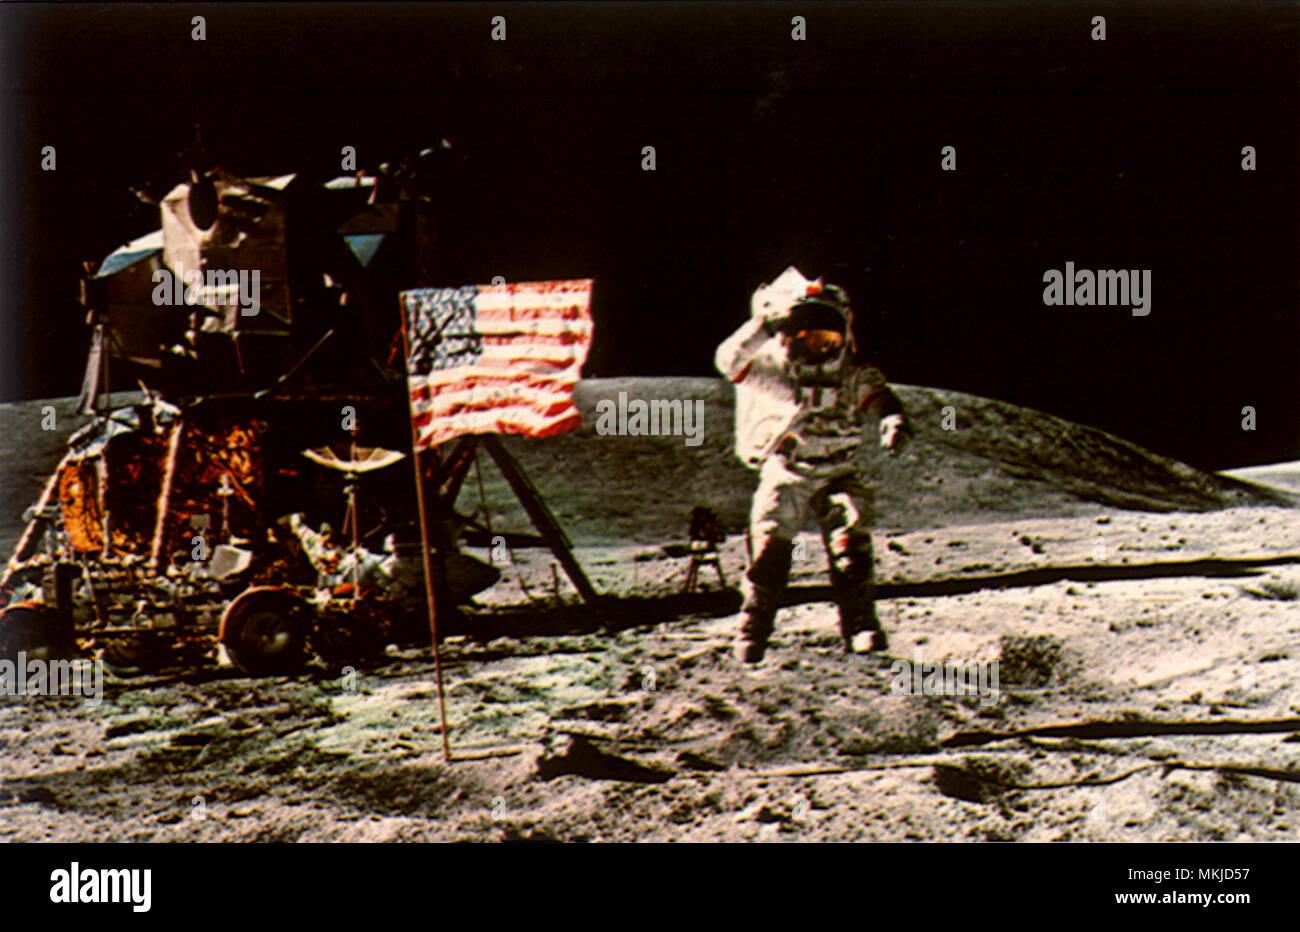 Man on the Moon - Stock Image